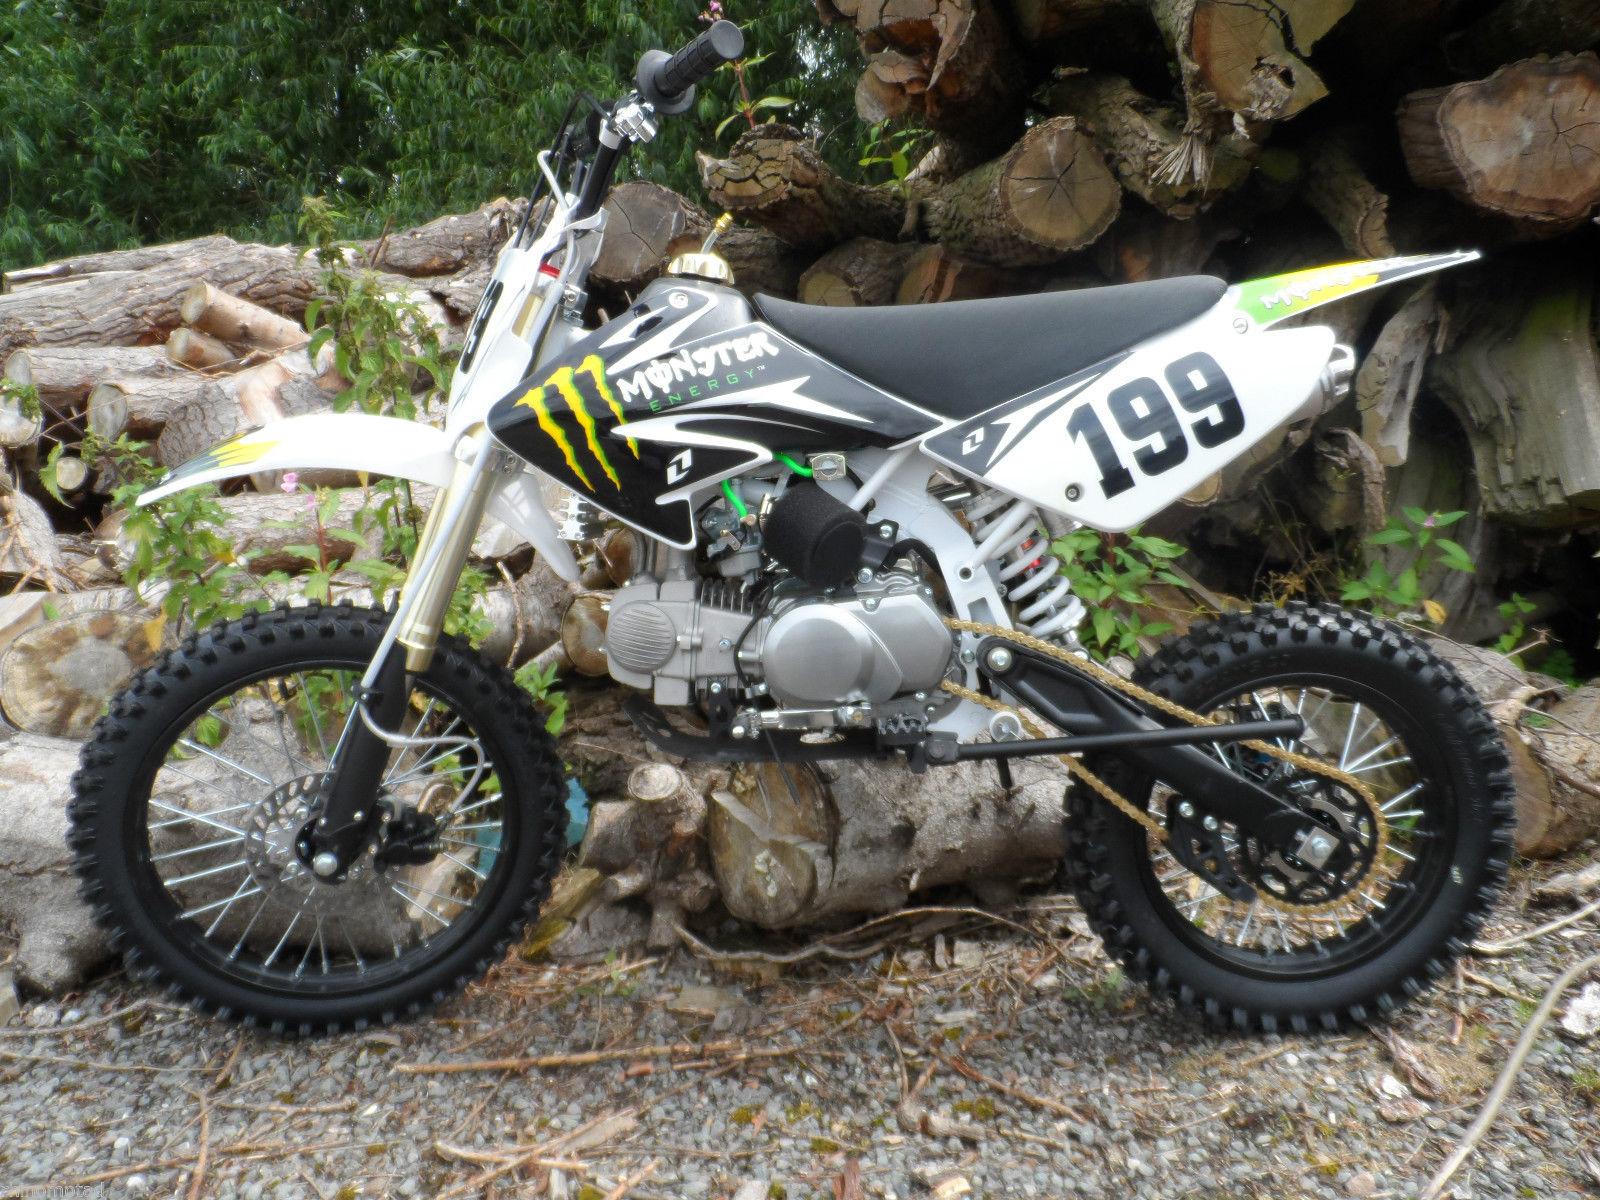 New Pbs Z Crf Sized Pit Bike Yx Engine Amp Big Wheels As Standard